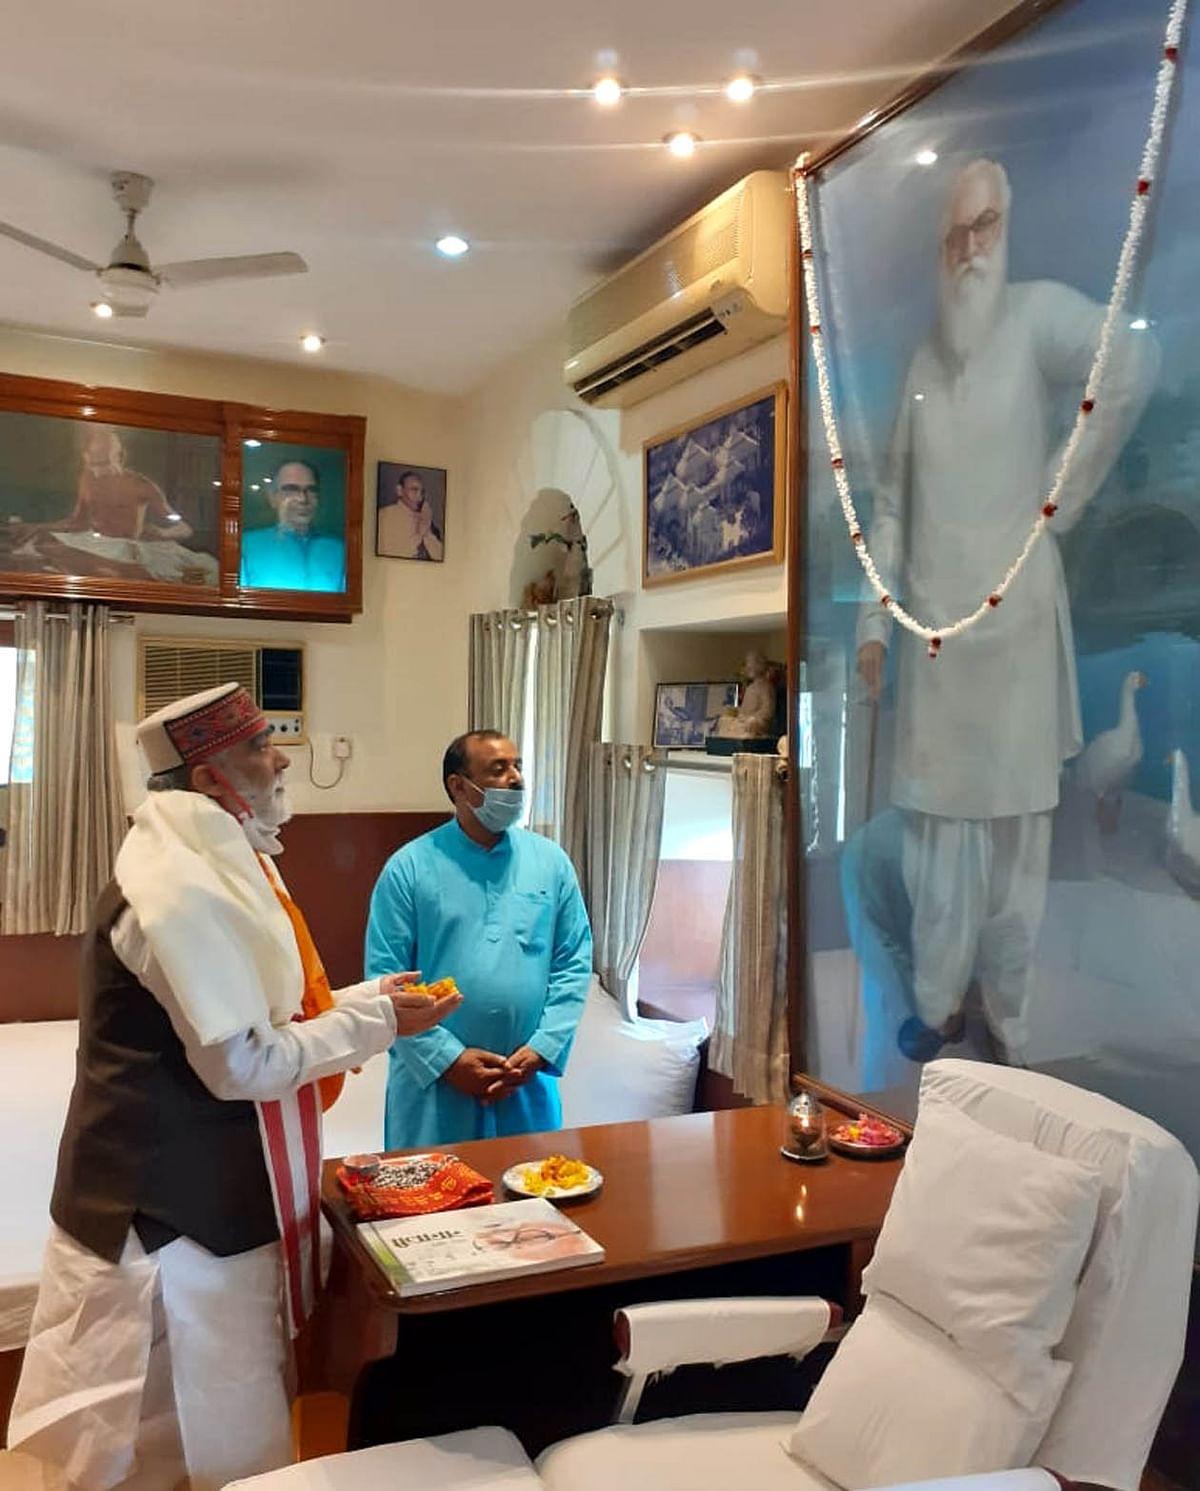 केन्द्रीय राज्यमंत्री अश्विनी कुमार चौबे ने सियाराम कुटीर पहुंचकर नानाजी देशमुख को दी श्रद्धांजलि